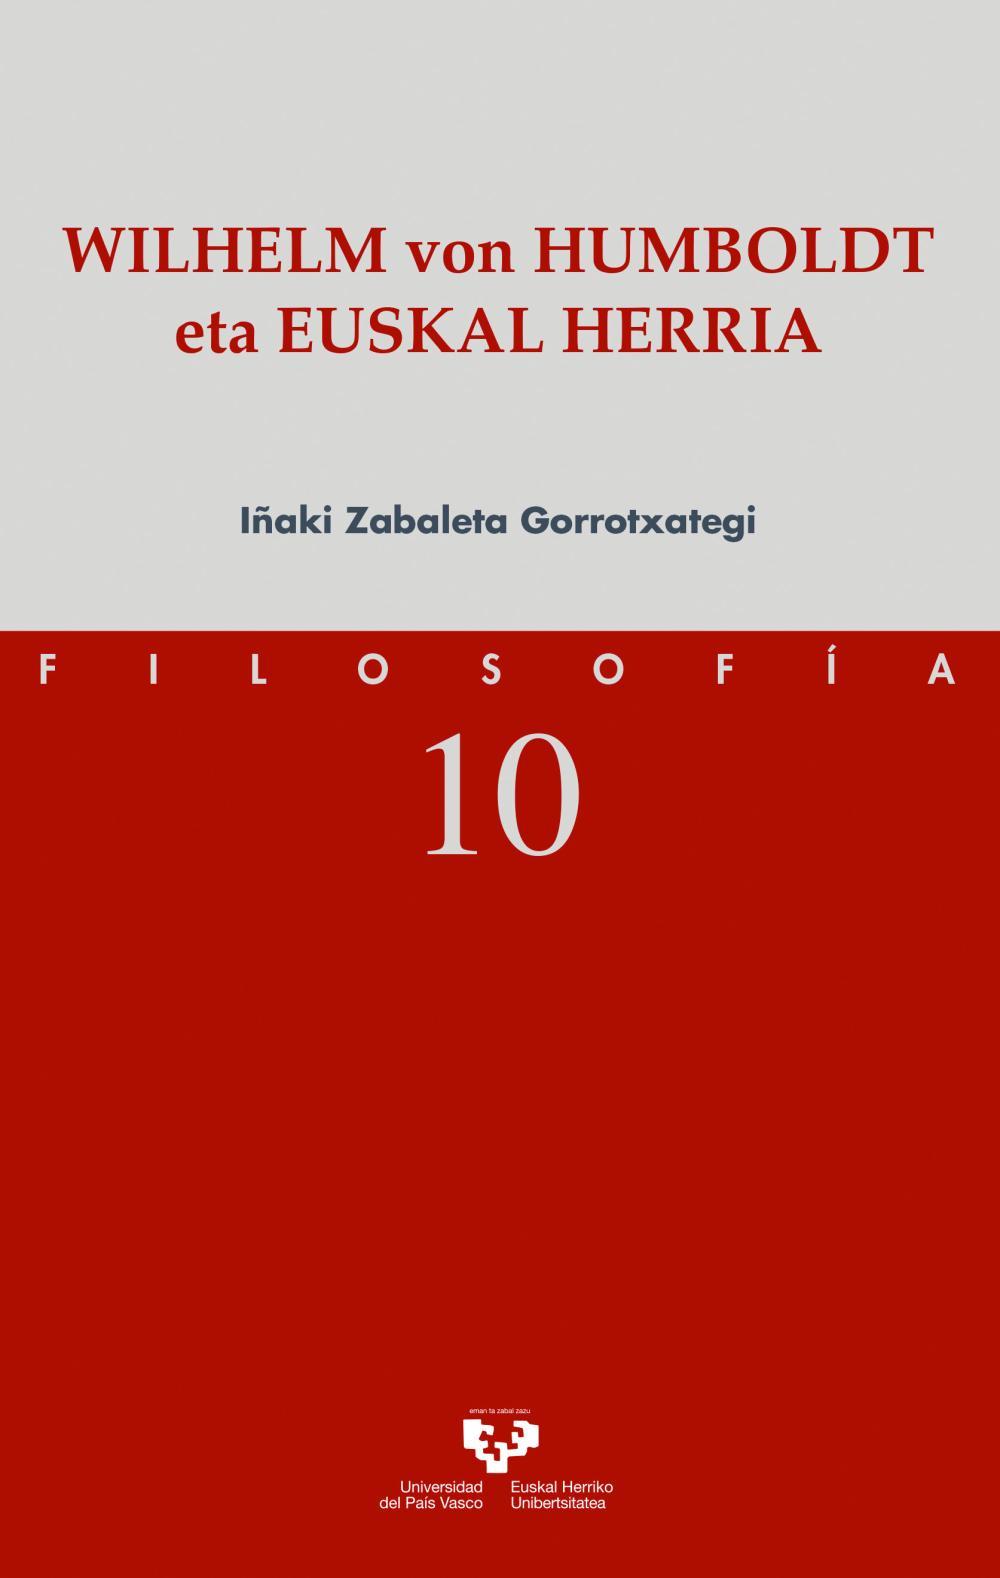 Wilhelm von Humboldt eta Euskal Herria